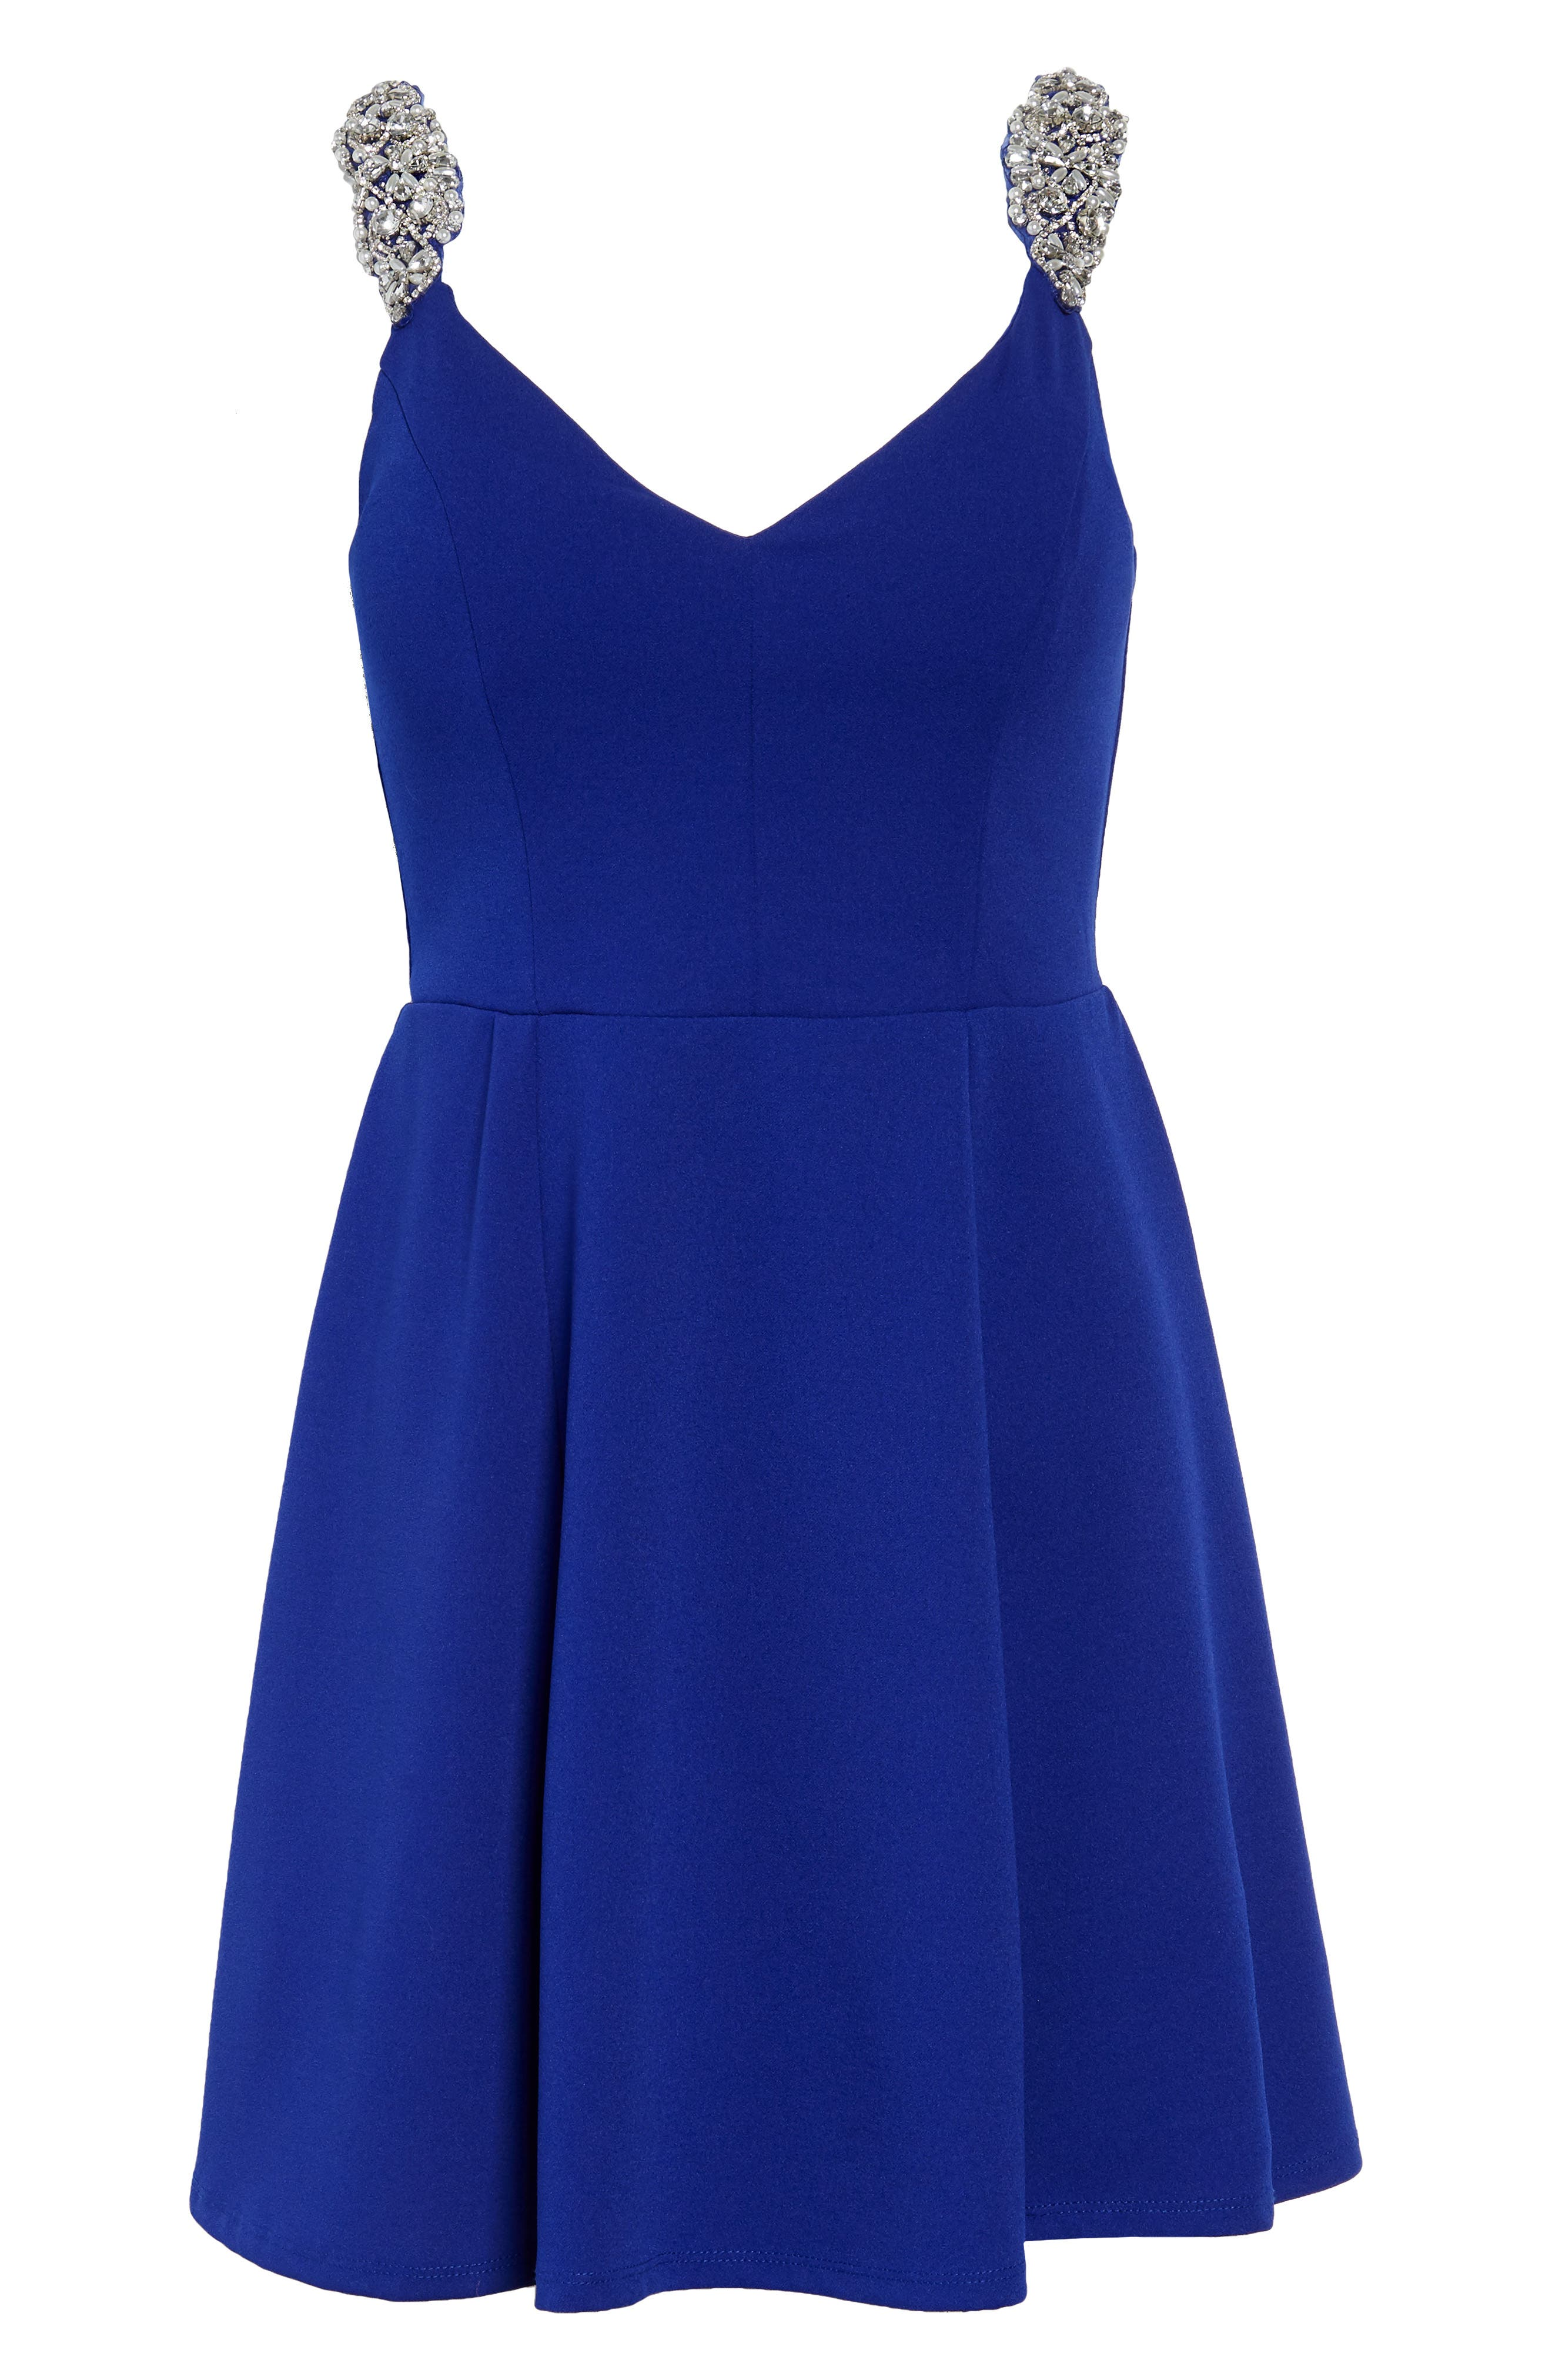 Jewel Strap Skater Dress,                             Alternate thumbnail 7, color,                             ROYAL